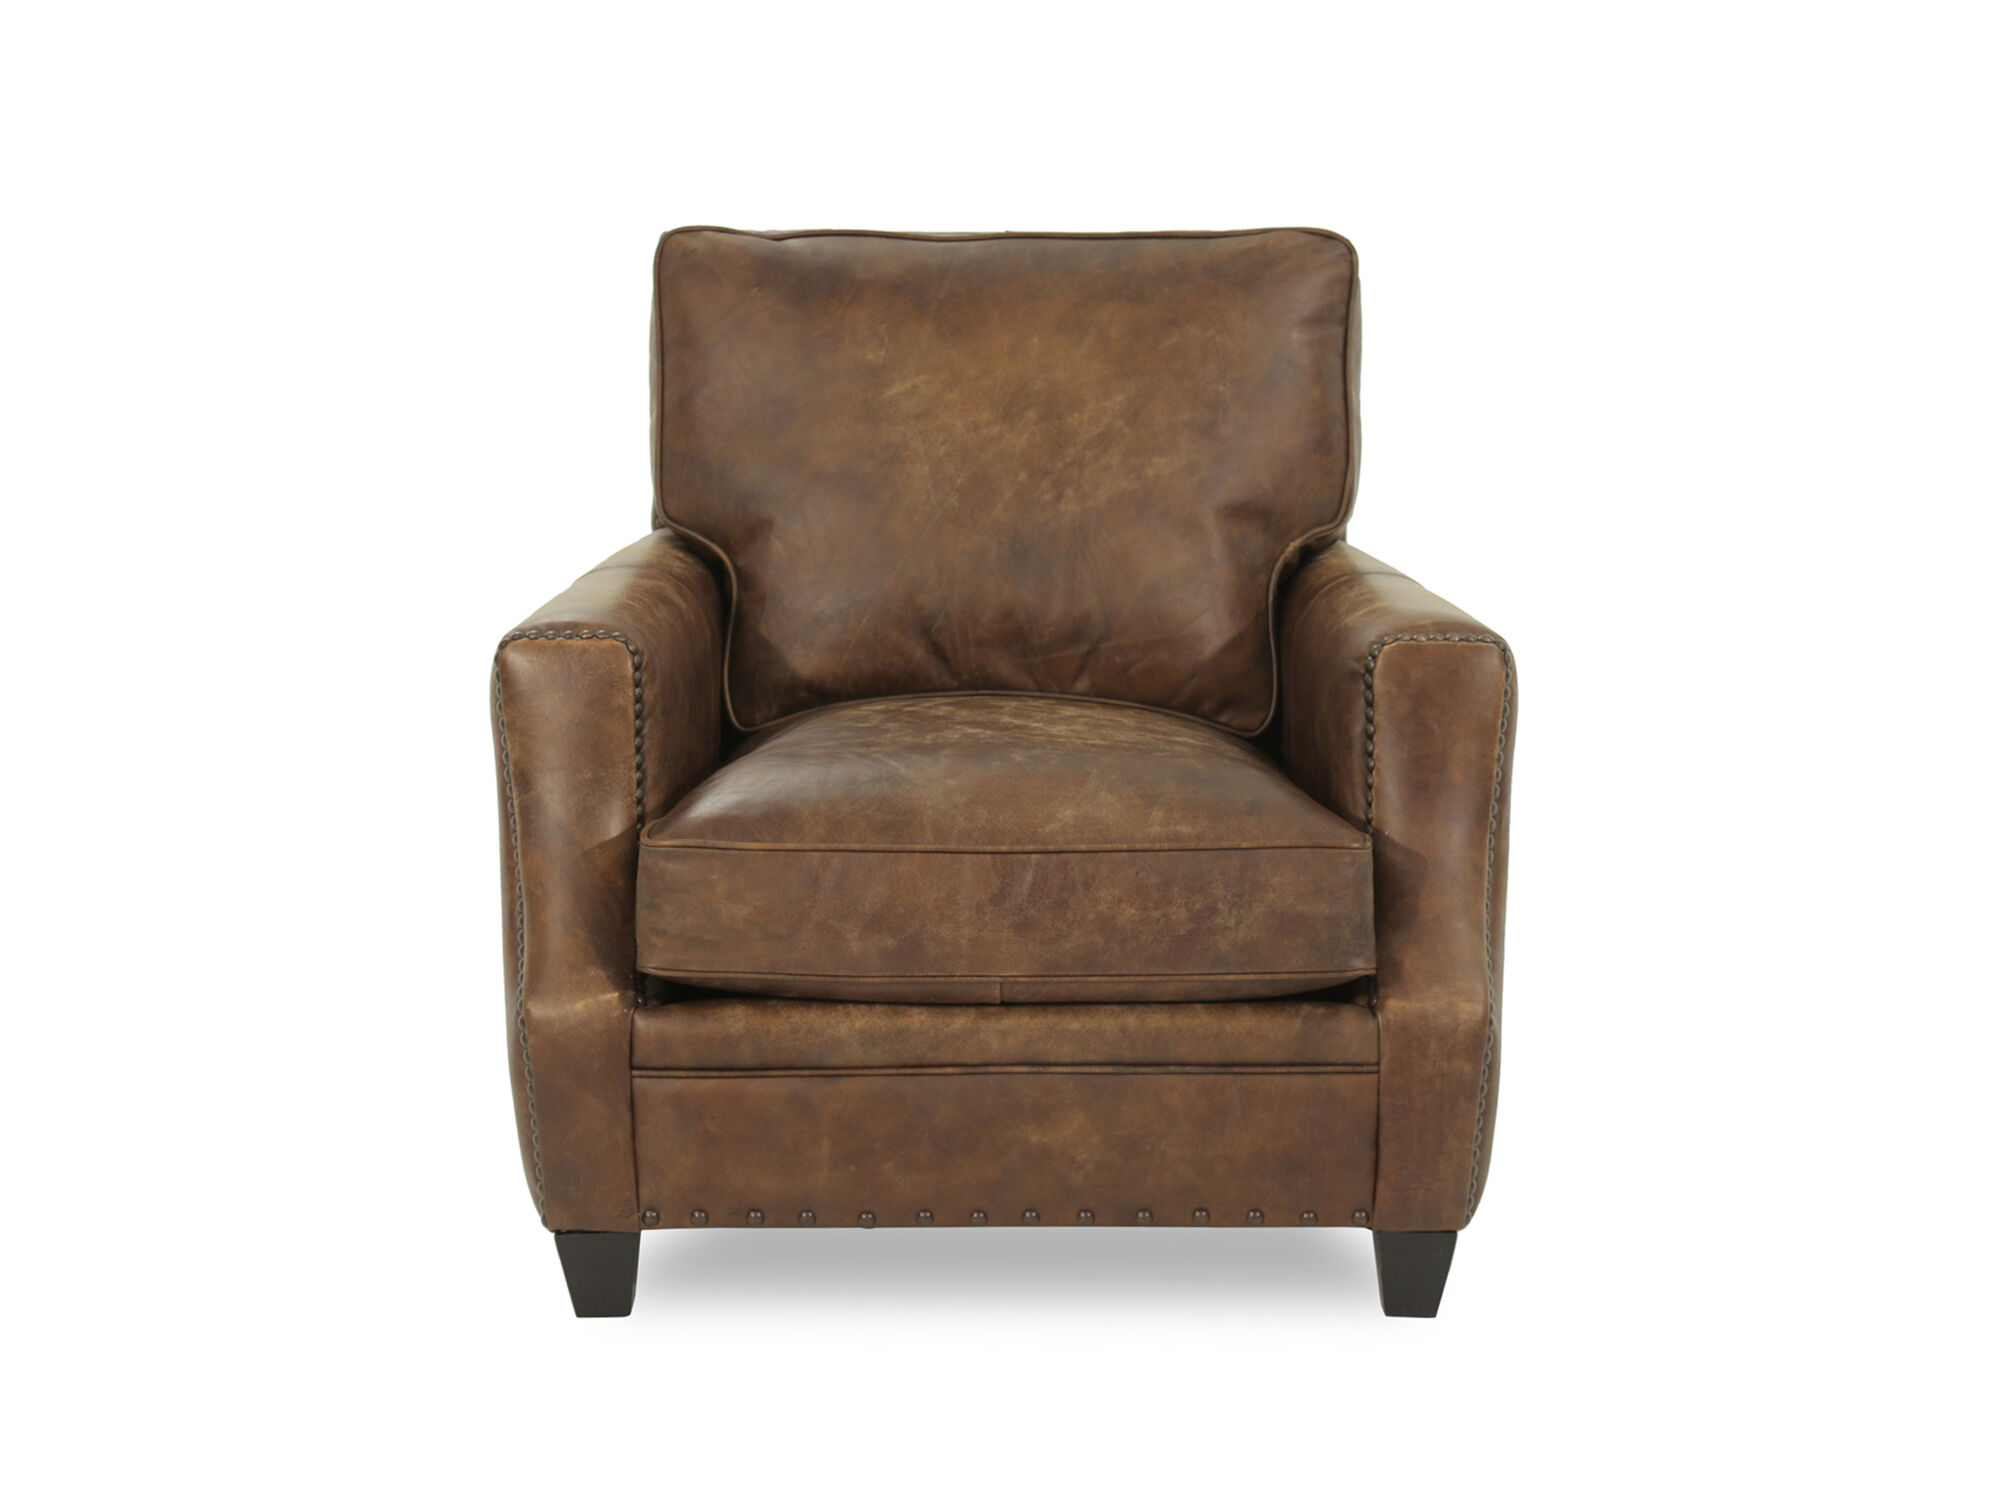 Charming Bernhardt Barclay Leather Mocha Chair